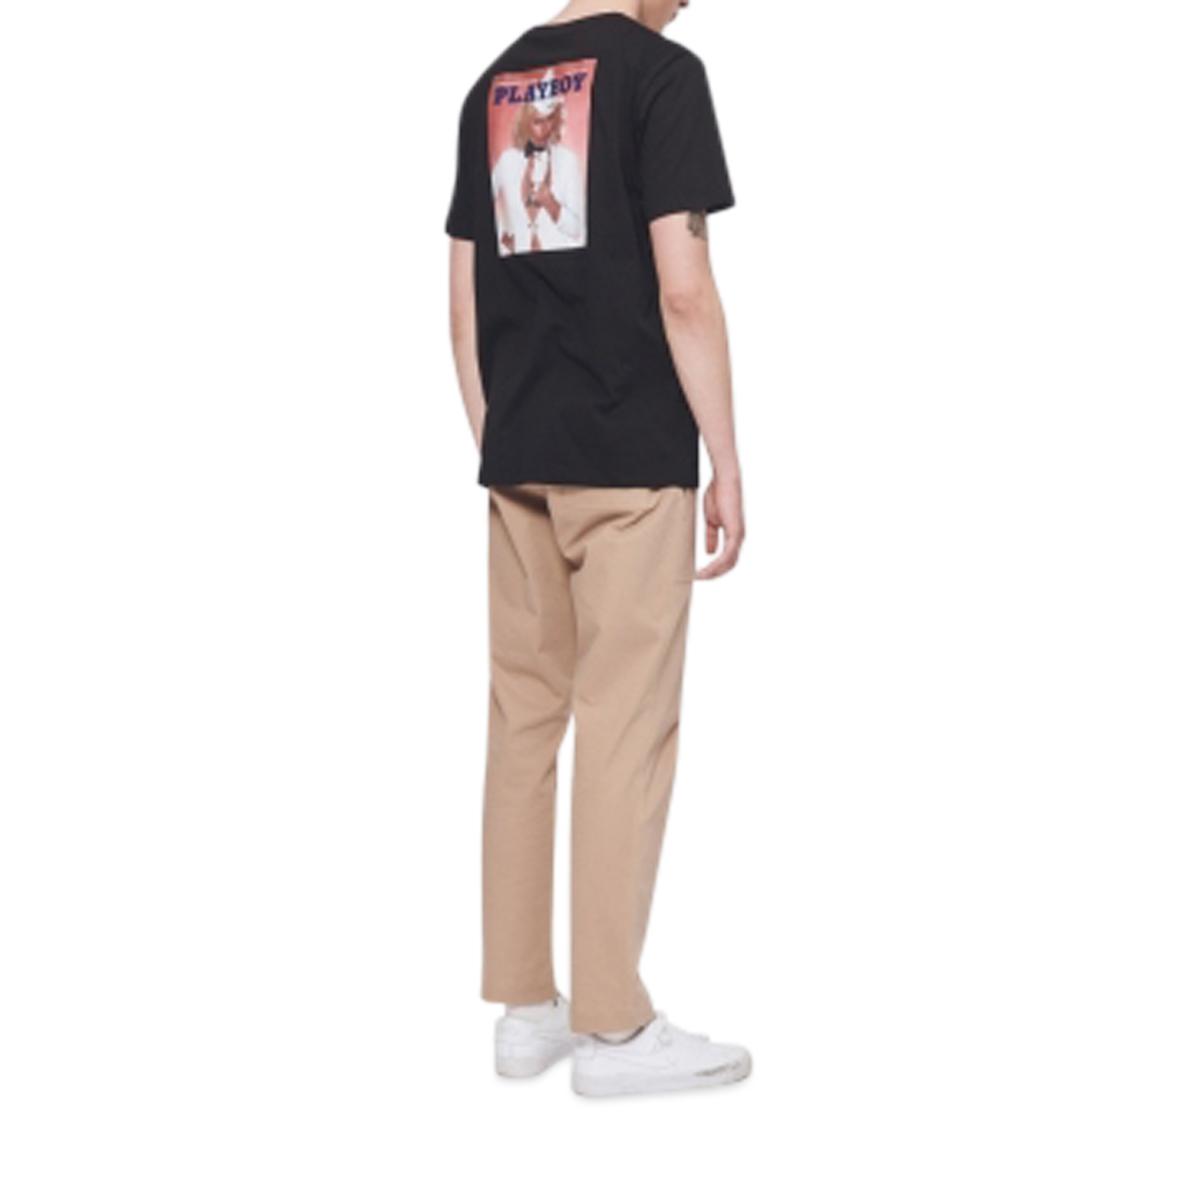 soulland Meets Playboy T-Shirt